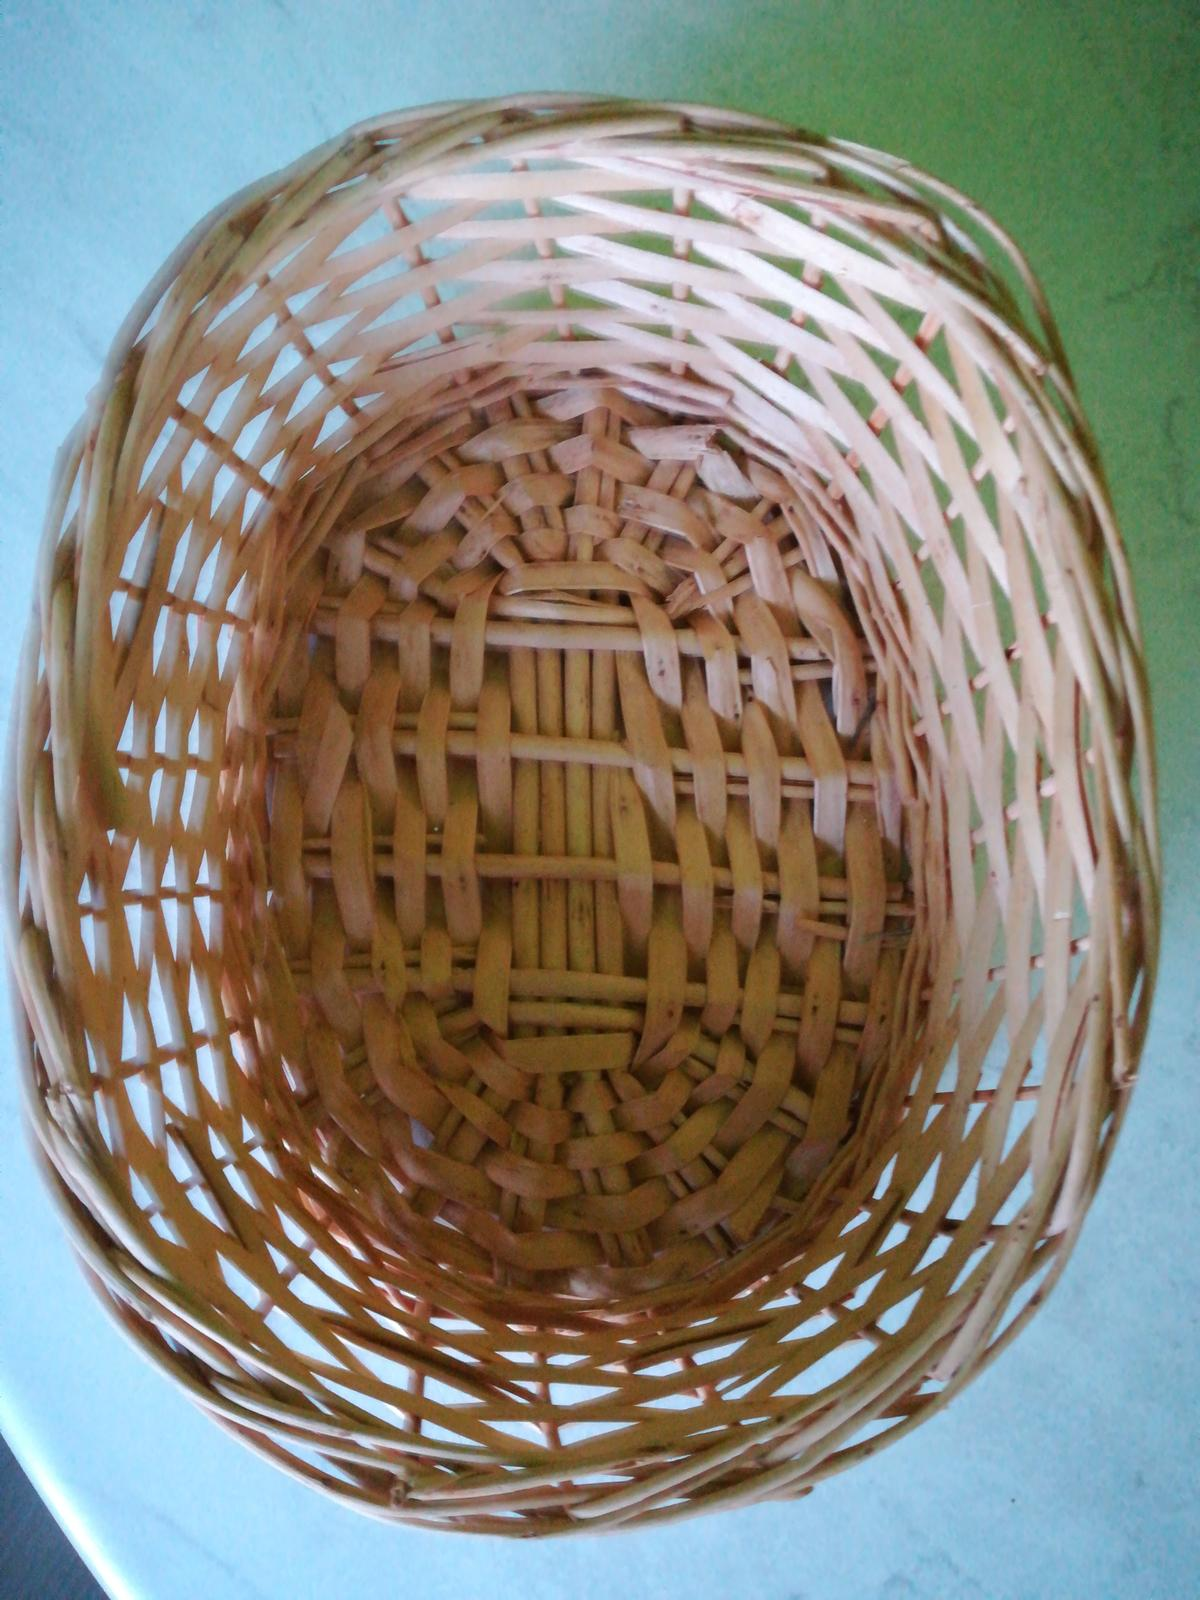 Prútený košík  - Obrázok č. 1